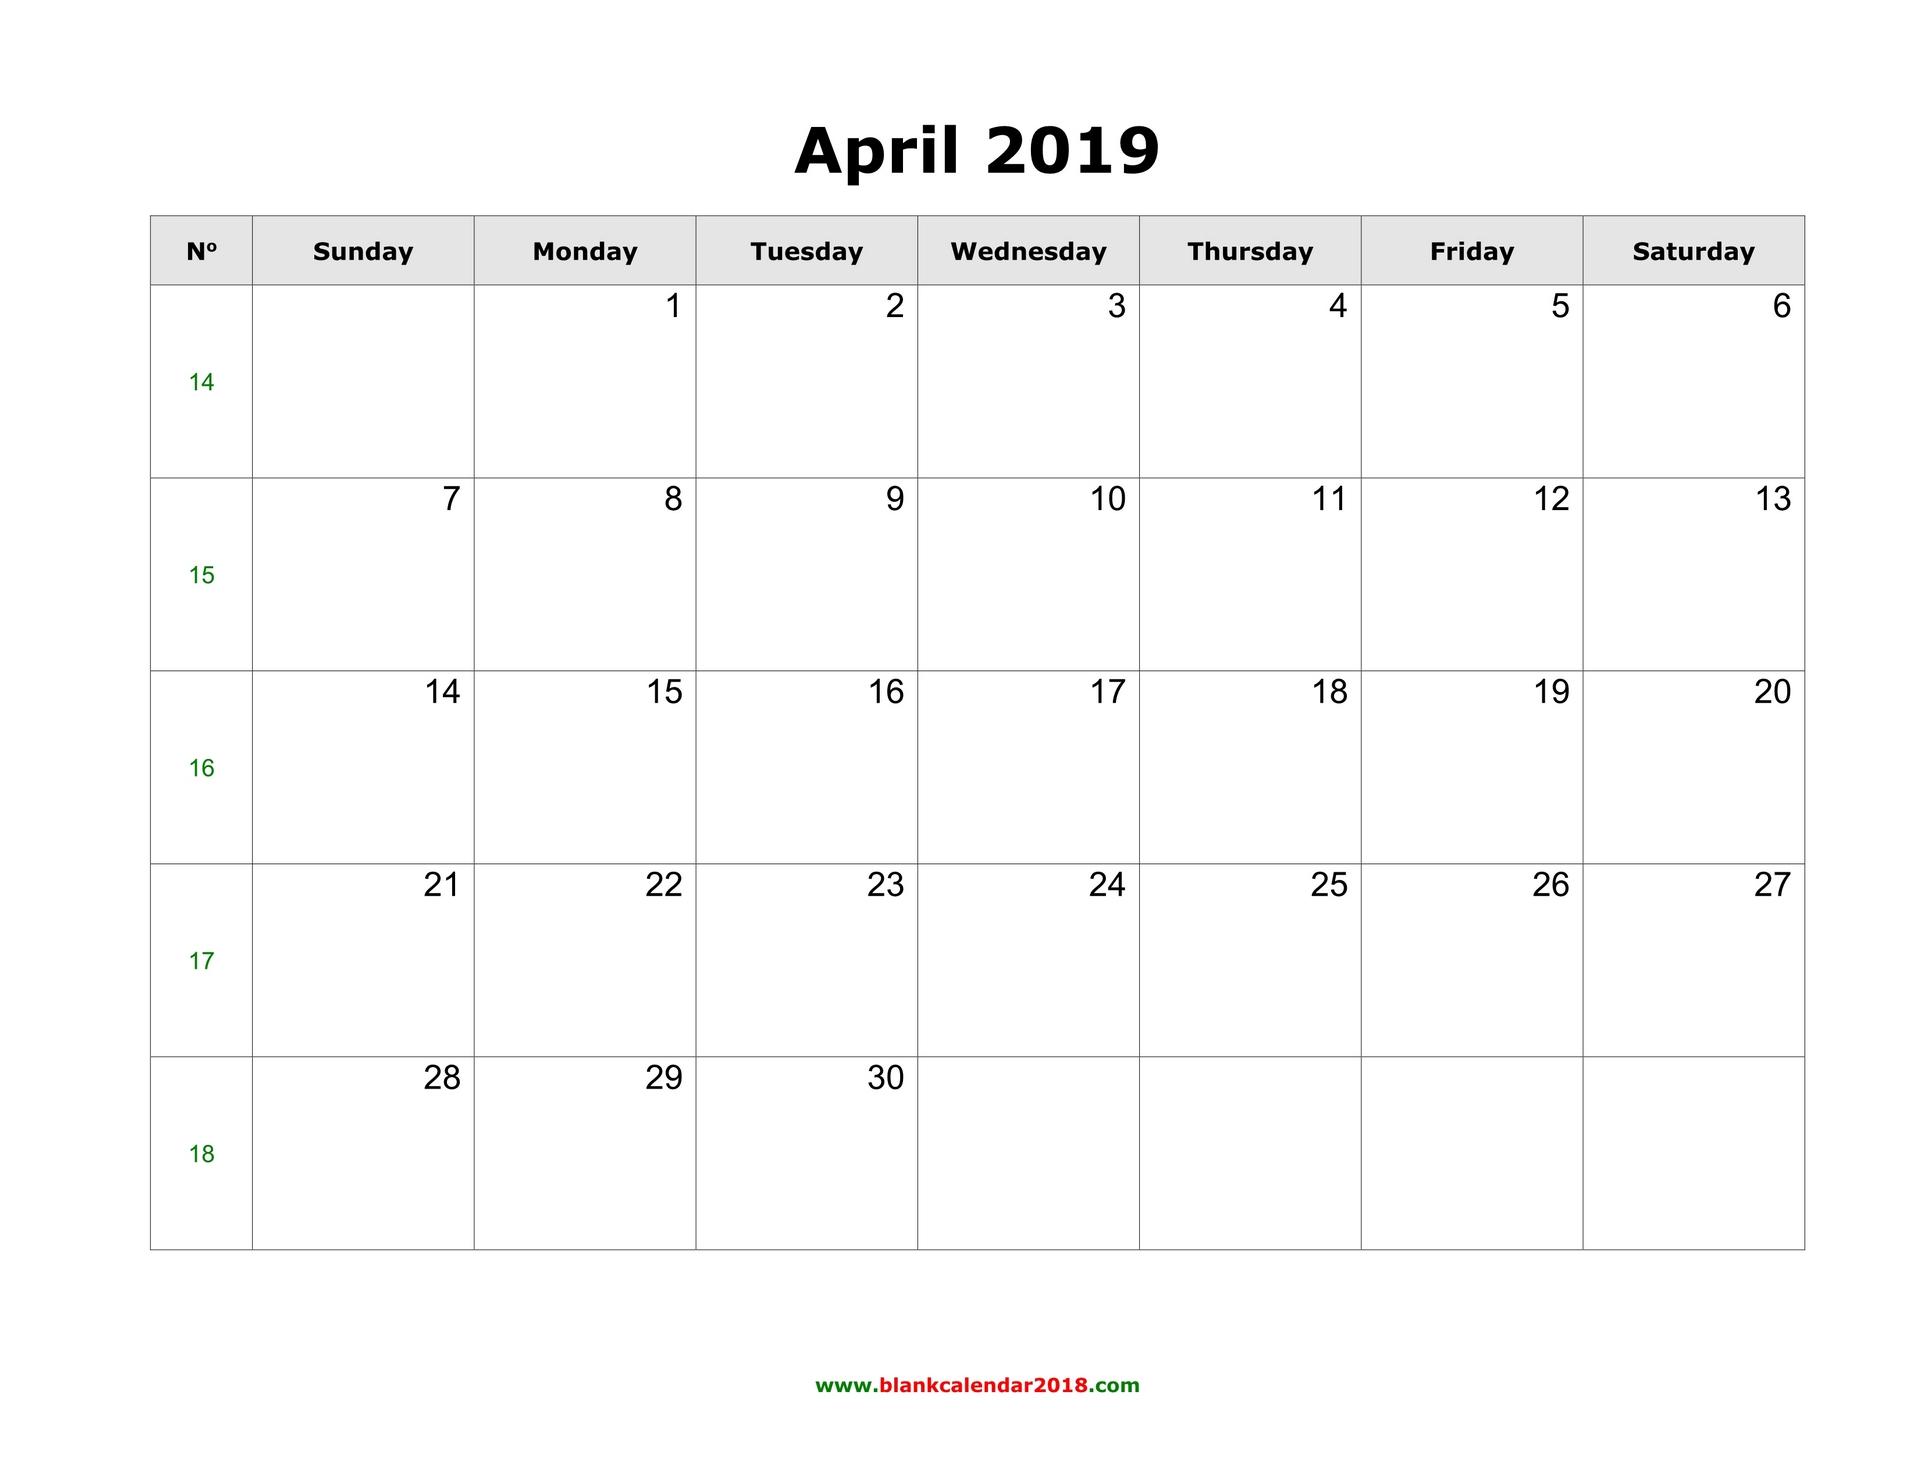 Blank Calendar For April 2019